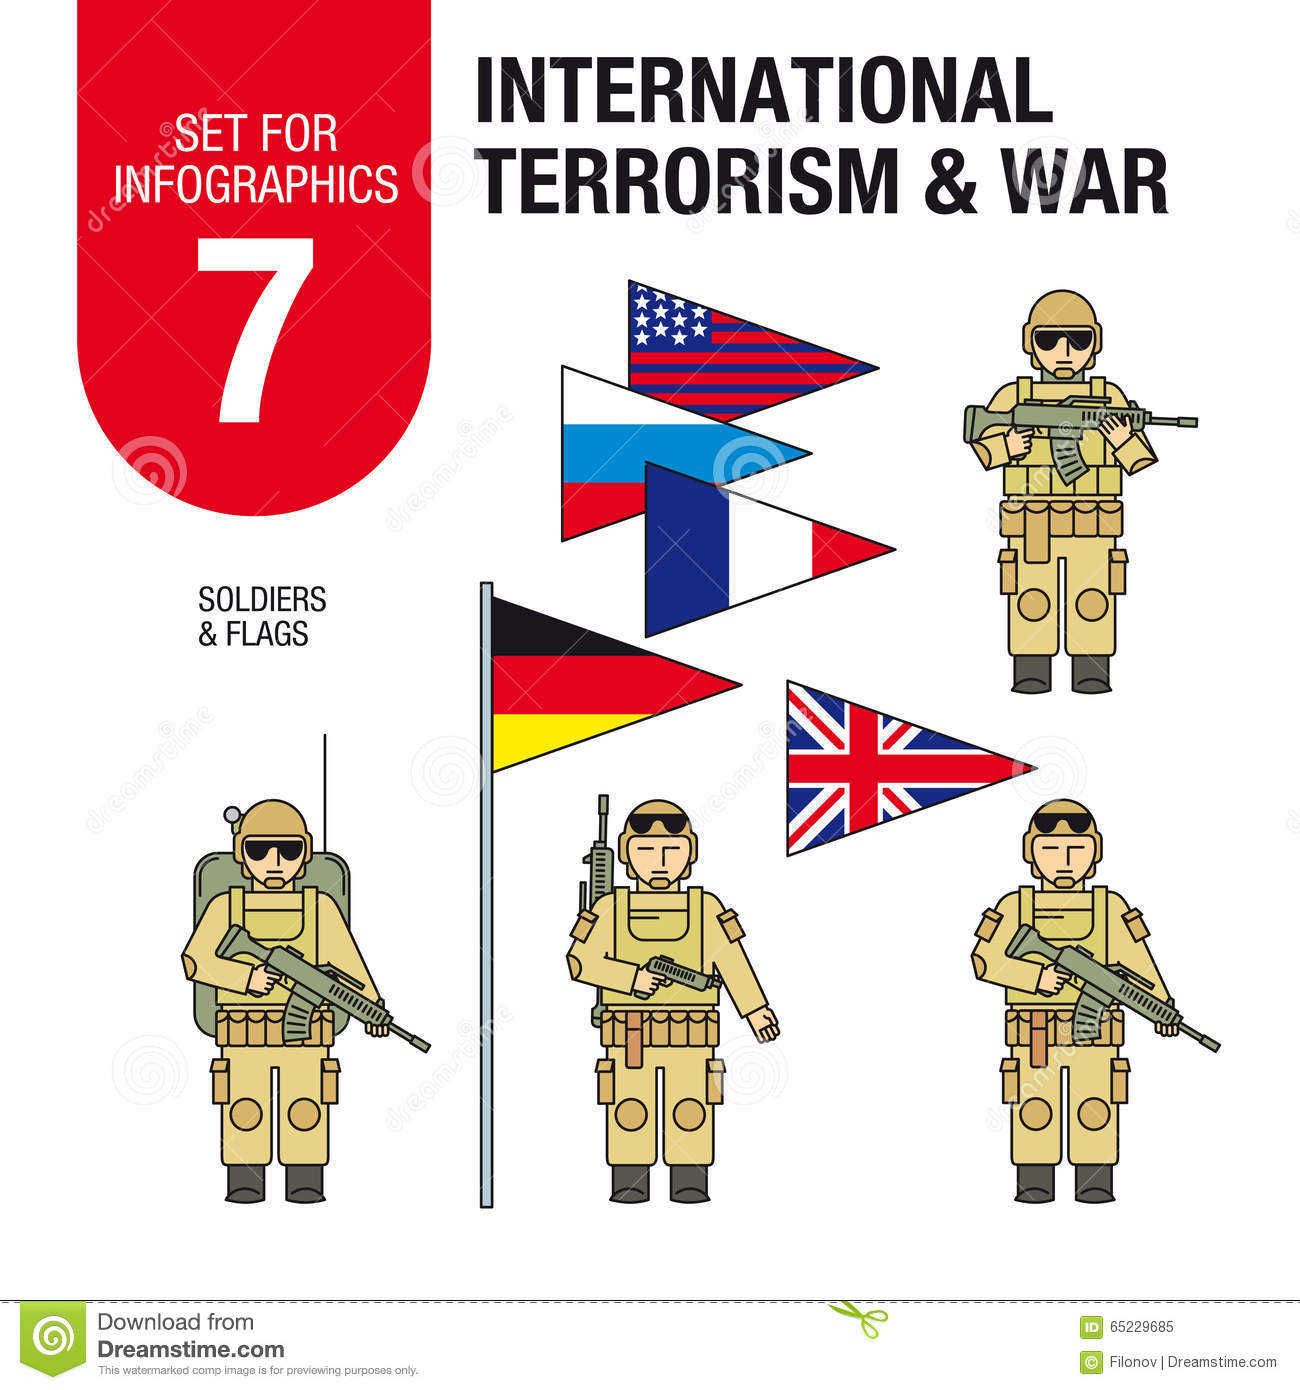 Set For Infographics #7: International Terrorism And War. Islamic.